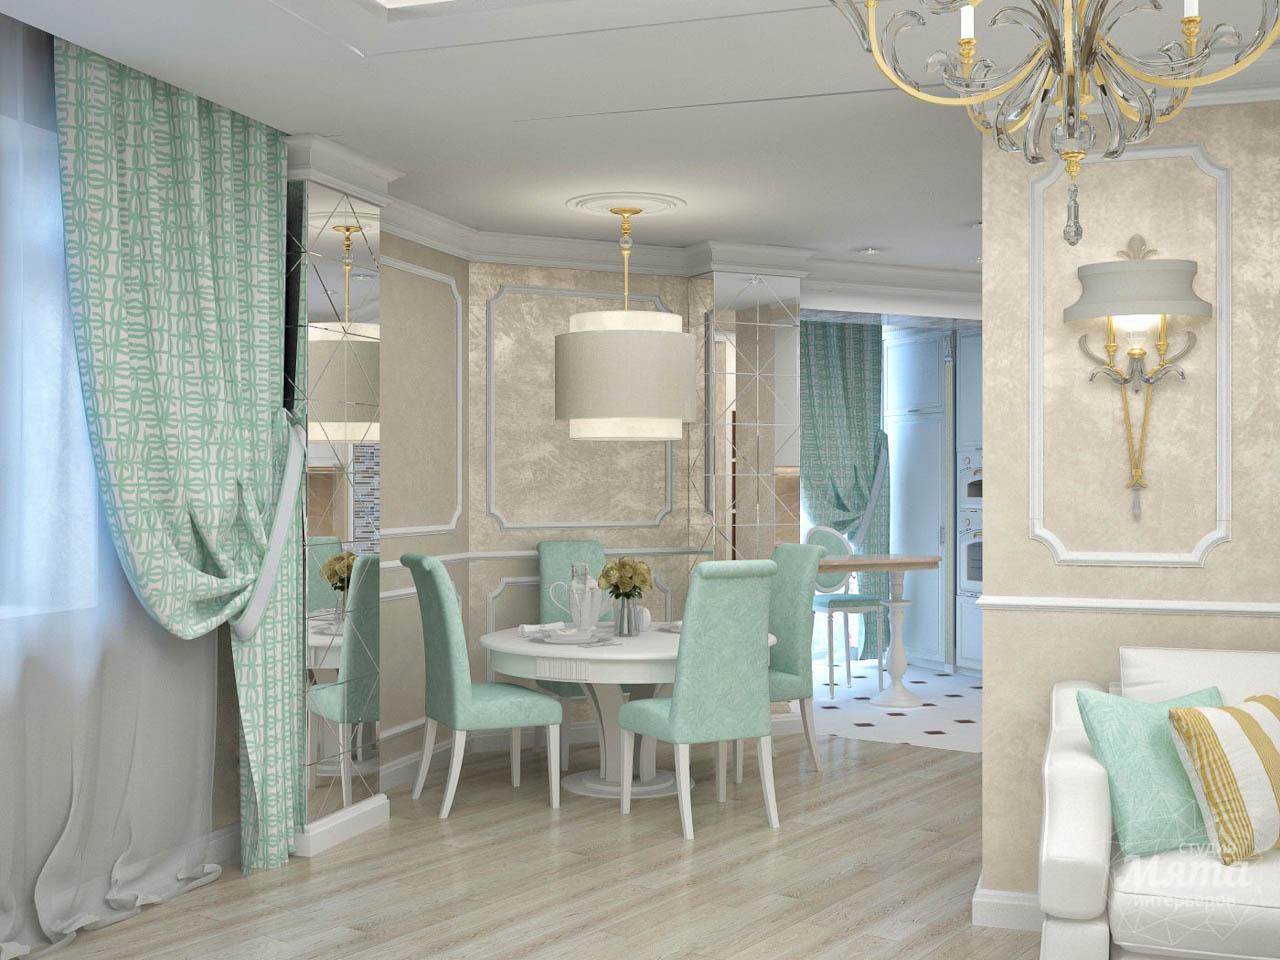 Дизайн интерьера и ремонт трехкомнатной квартиры по ул. 8 Марта 190 img2016498253